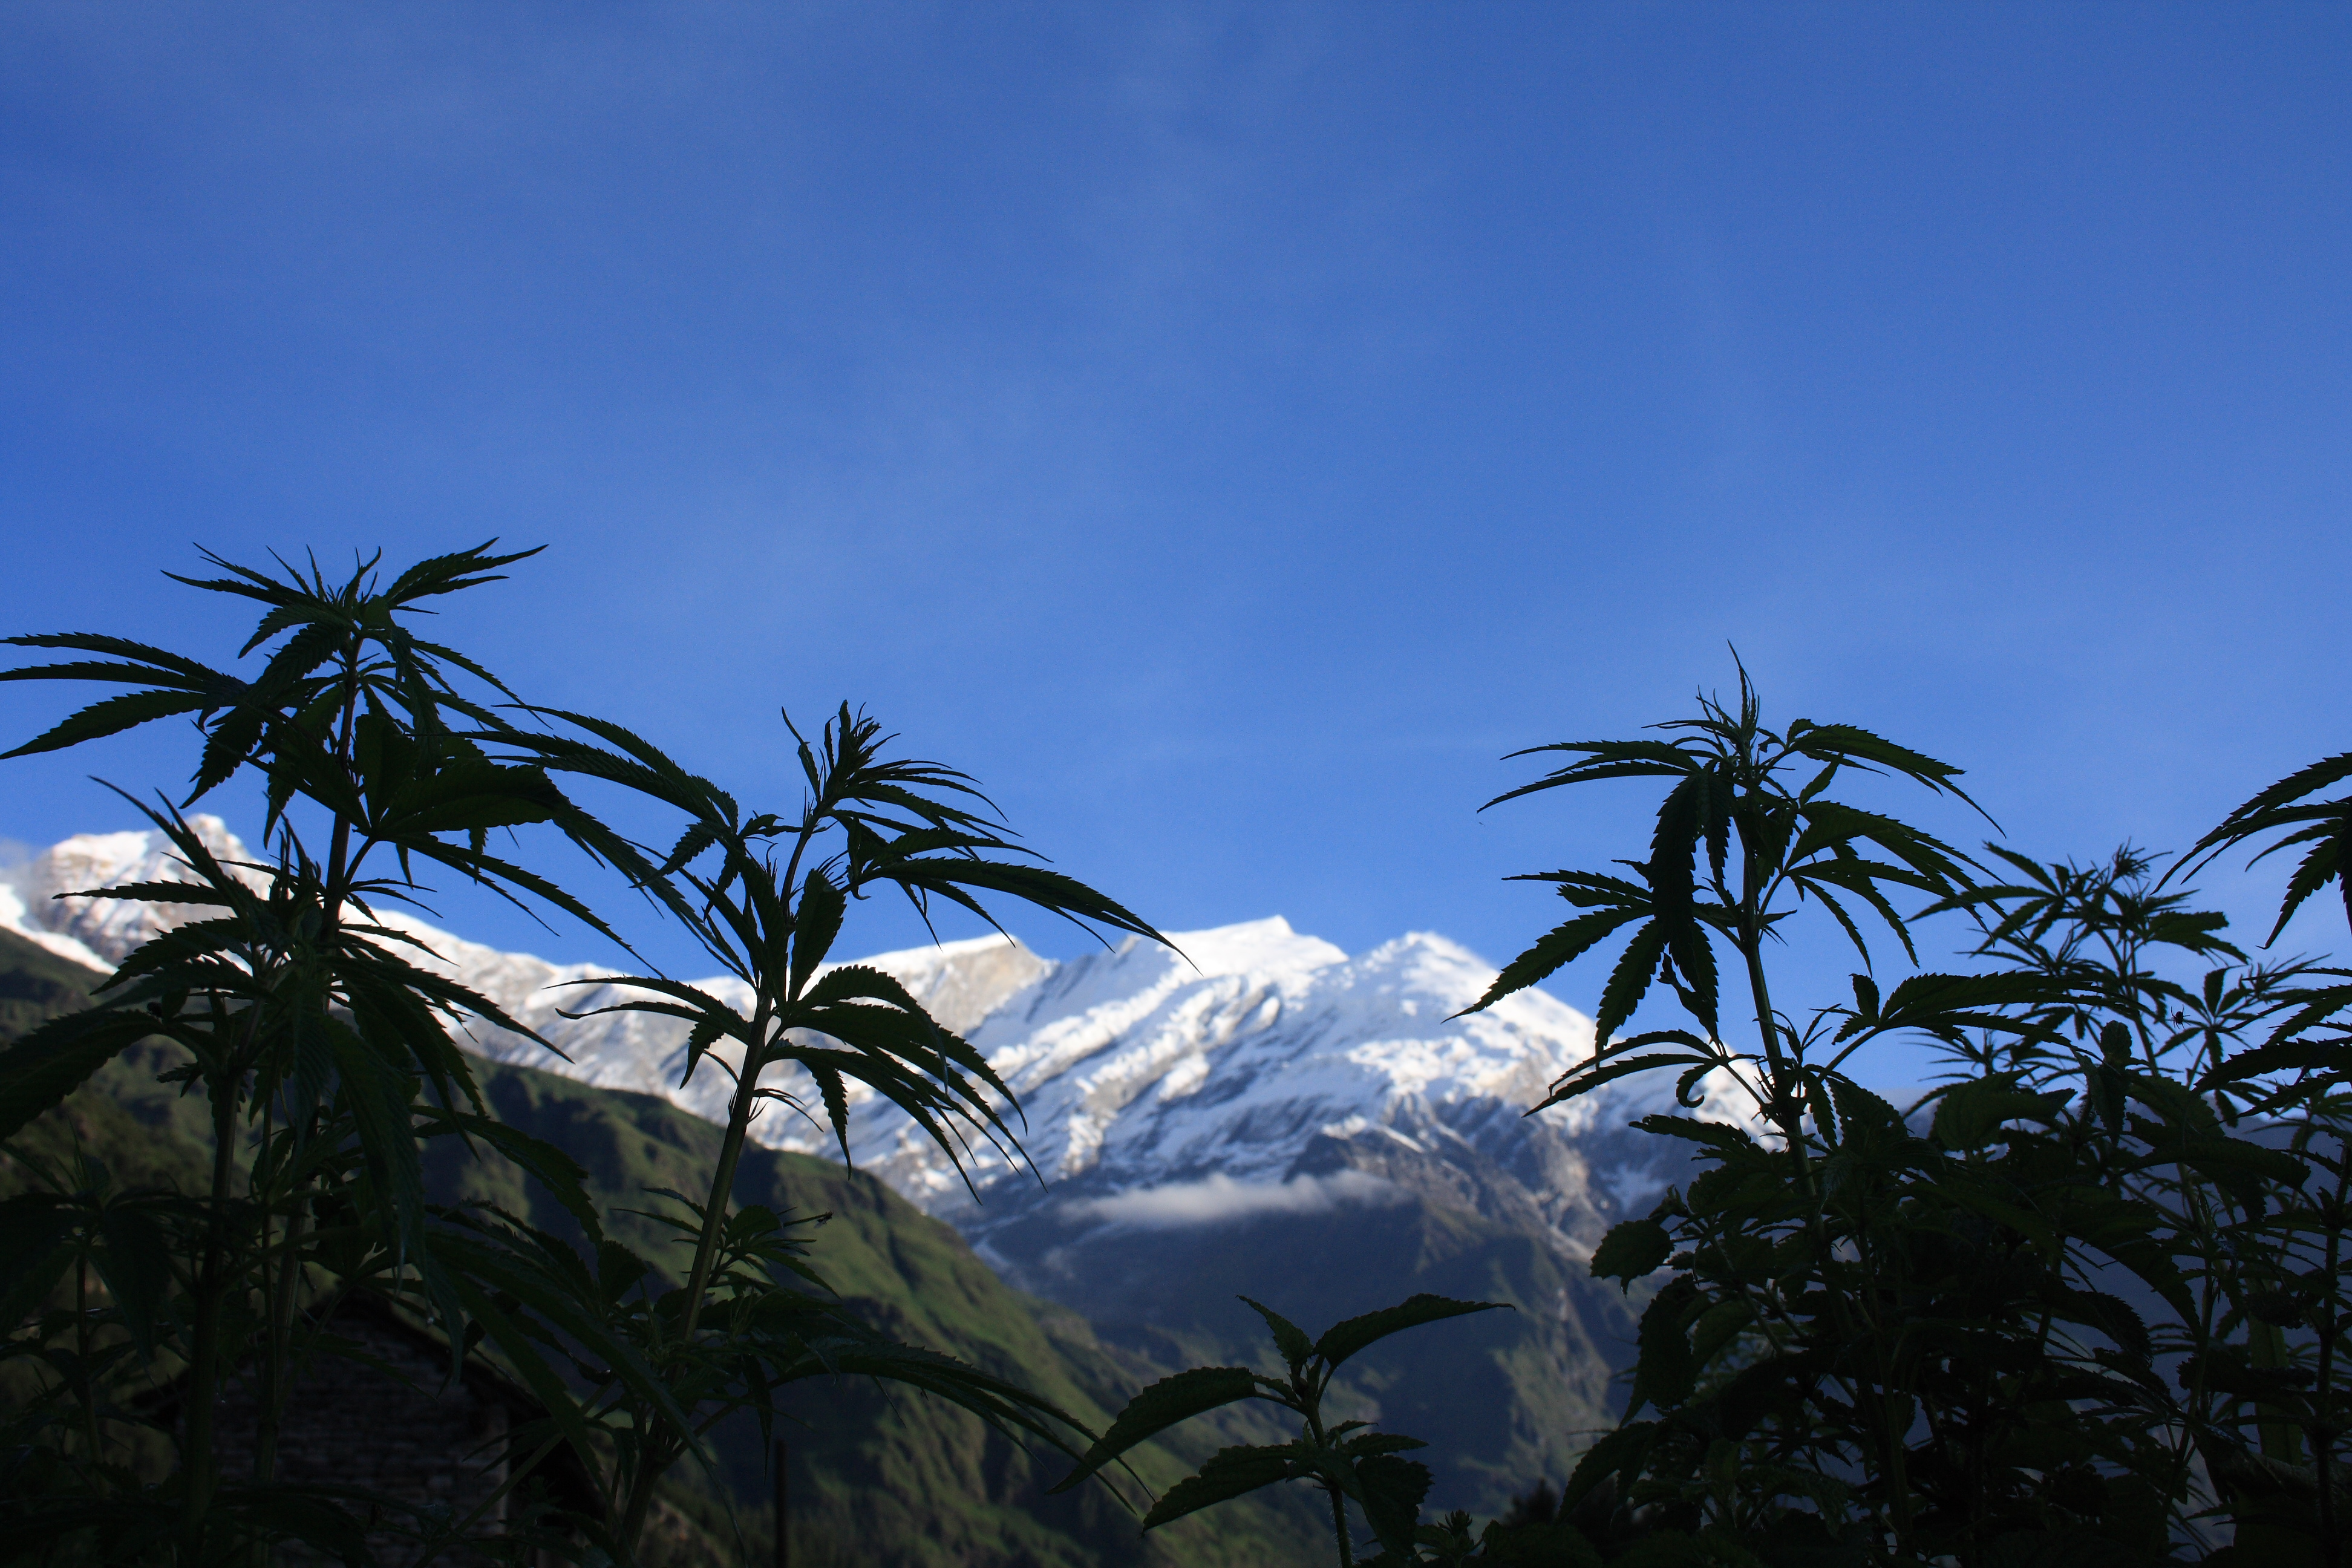 Drawn pot plant jamaican Heard Have Photo Cannabis? You